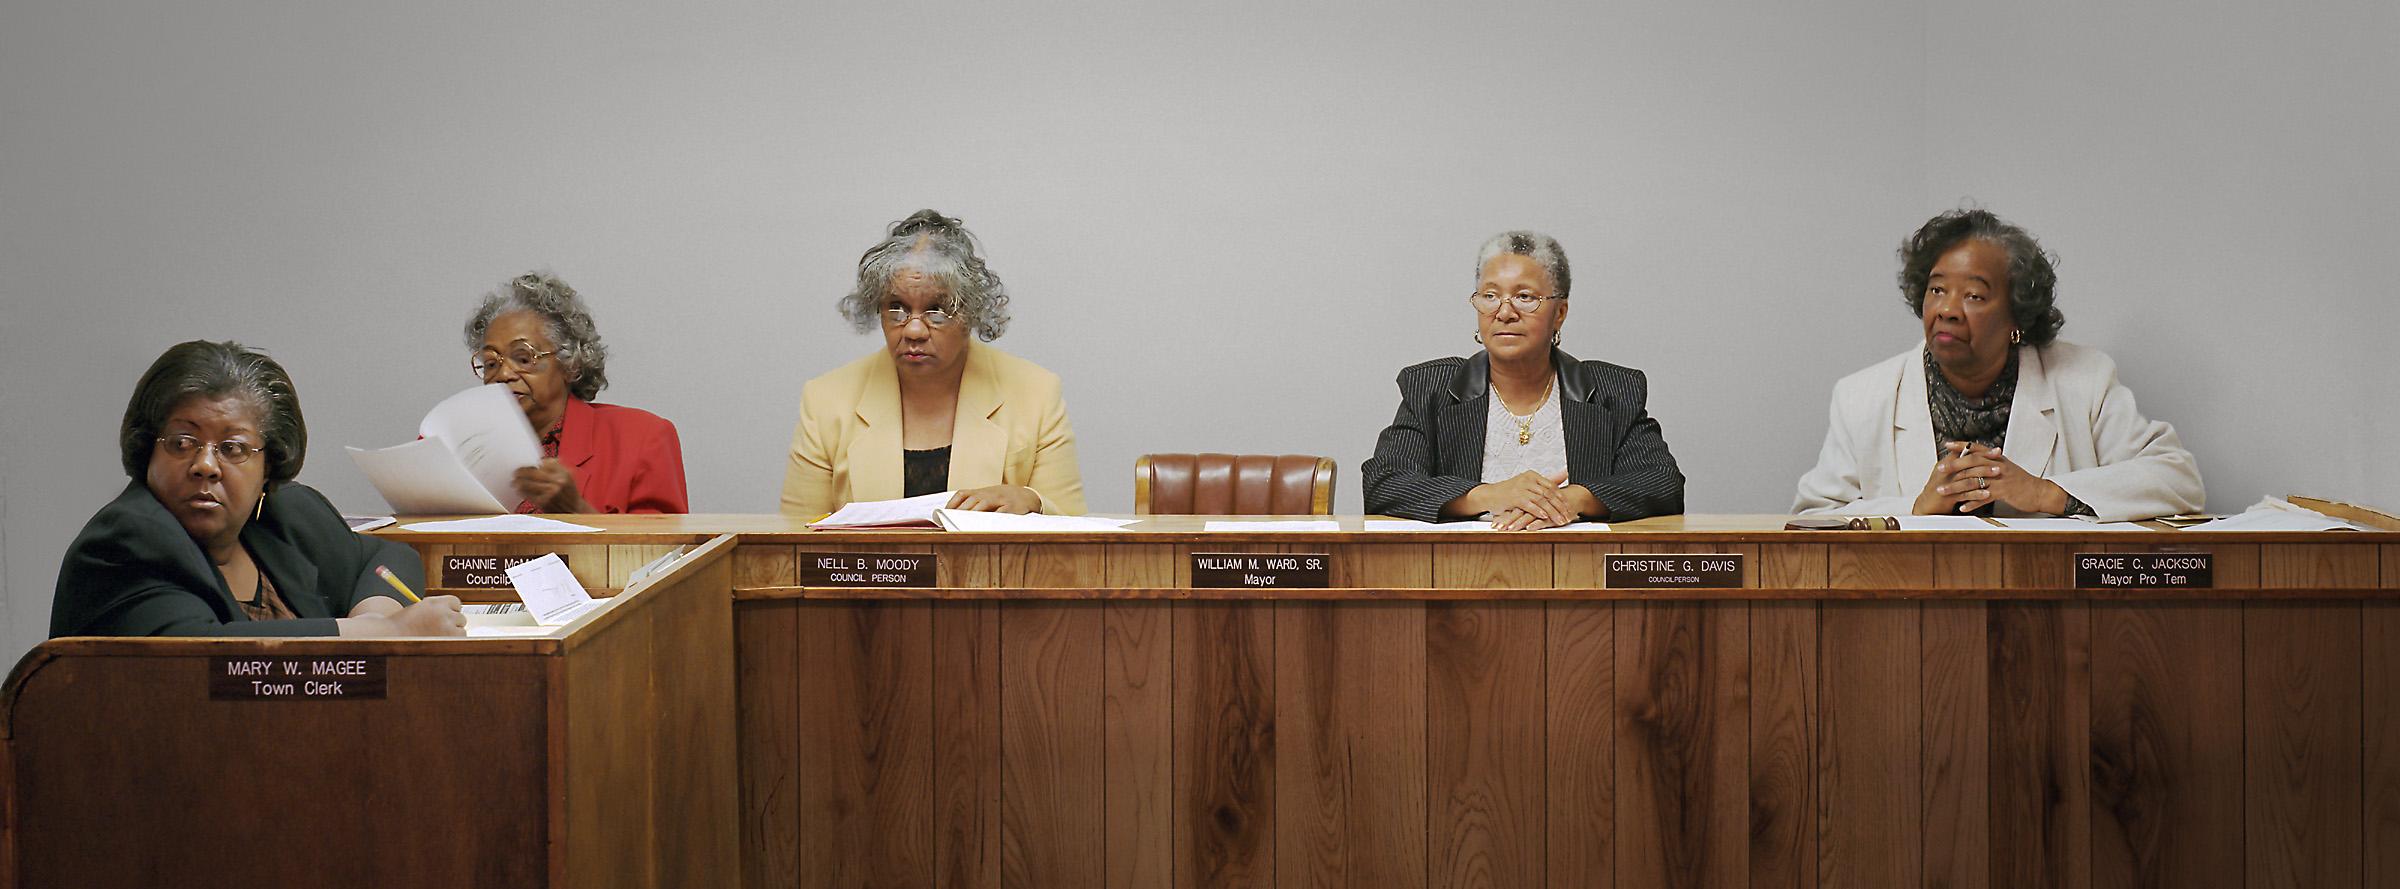 Dobbins Heights, North Carolina (population 936) Town Council, November 8, 2001 (L to R): Mary Magee (Clerk), Channie McManus, Nell Moody, Christine Davis, Gracie Jackson (Mayor Pro Tem), 2001.